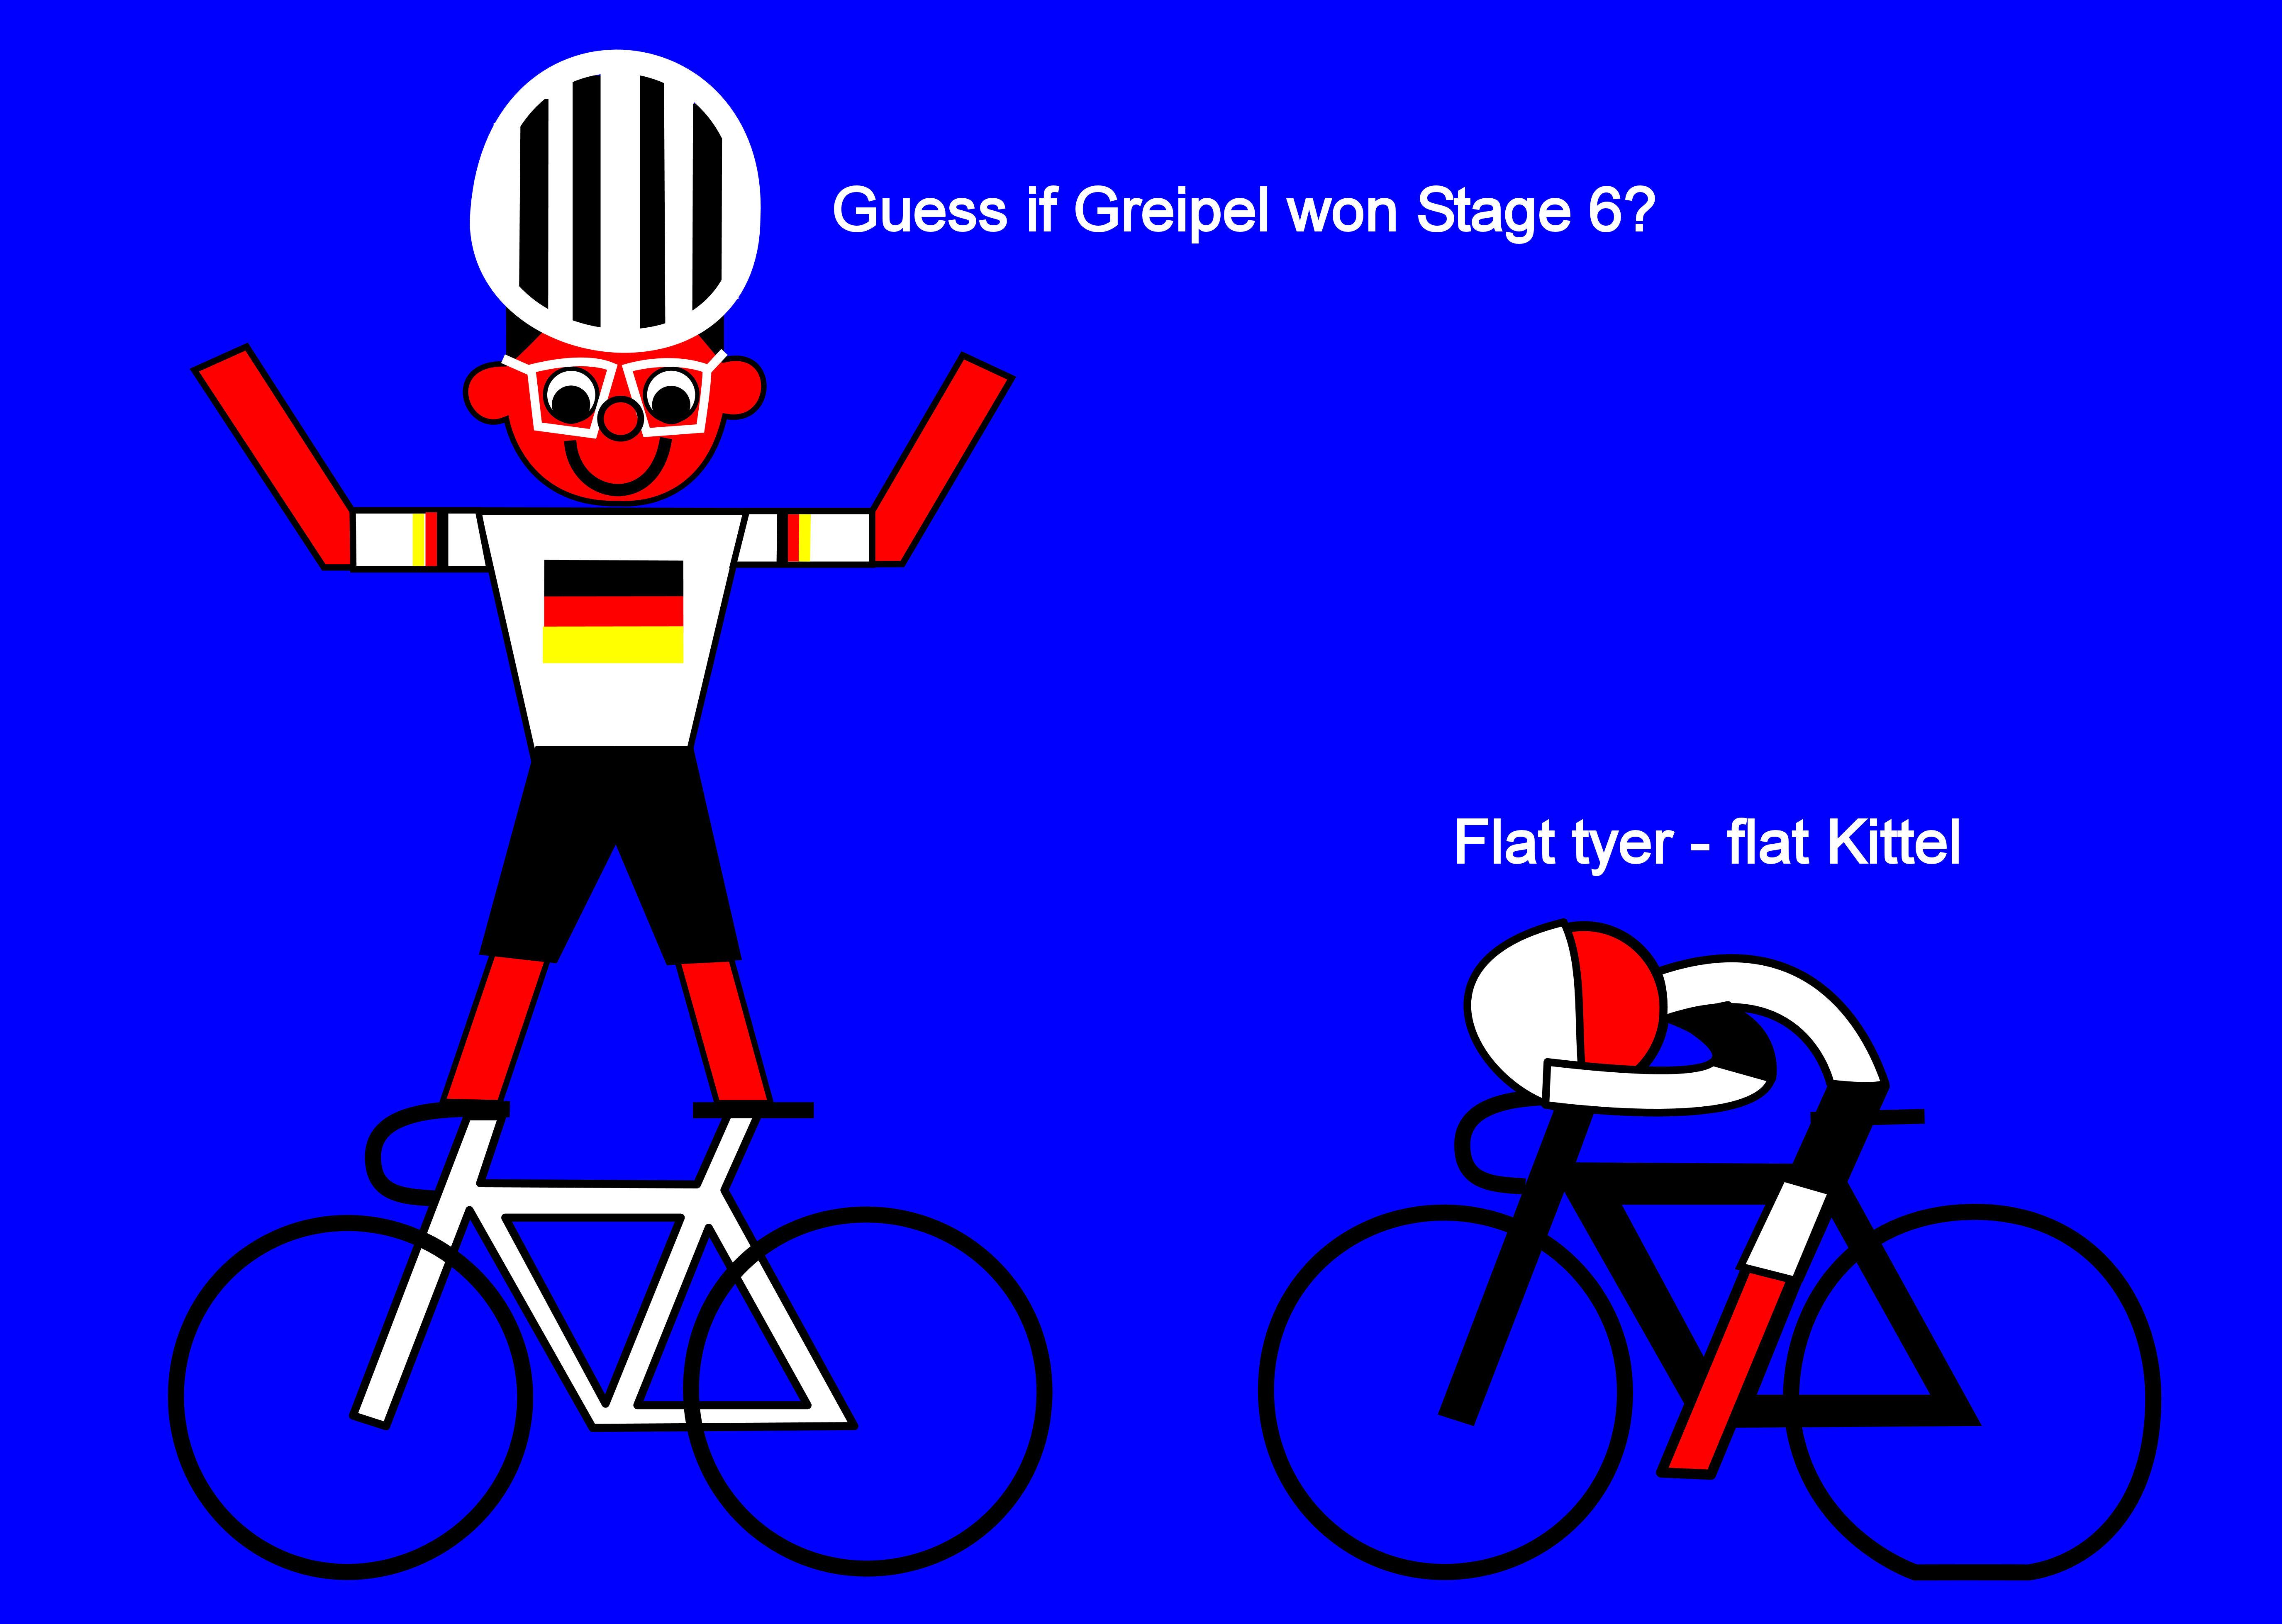 Arras, Reims, Greipel,                                         Kittel, stage 6, July 10th, Tour                                         de France 2014, Tour de France,                                         Arras, Reims, Greipel, Kittel,                                         étape 6, le 10 Juillet, Tour de                                         France 2014, Tour de France